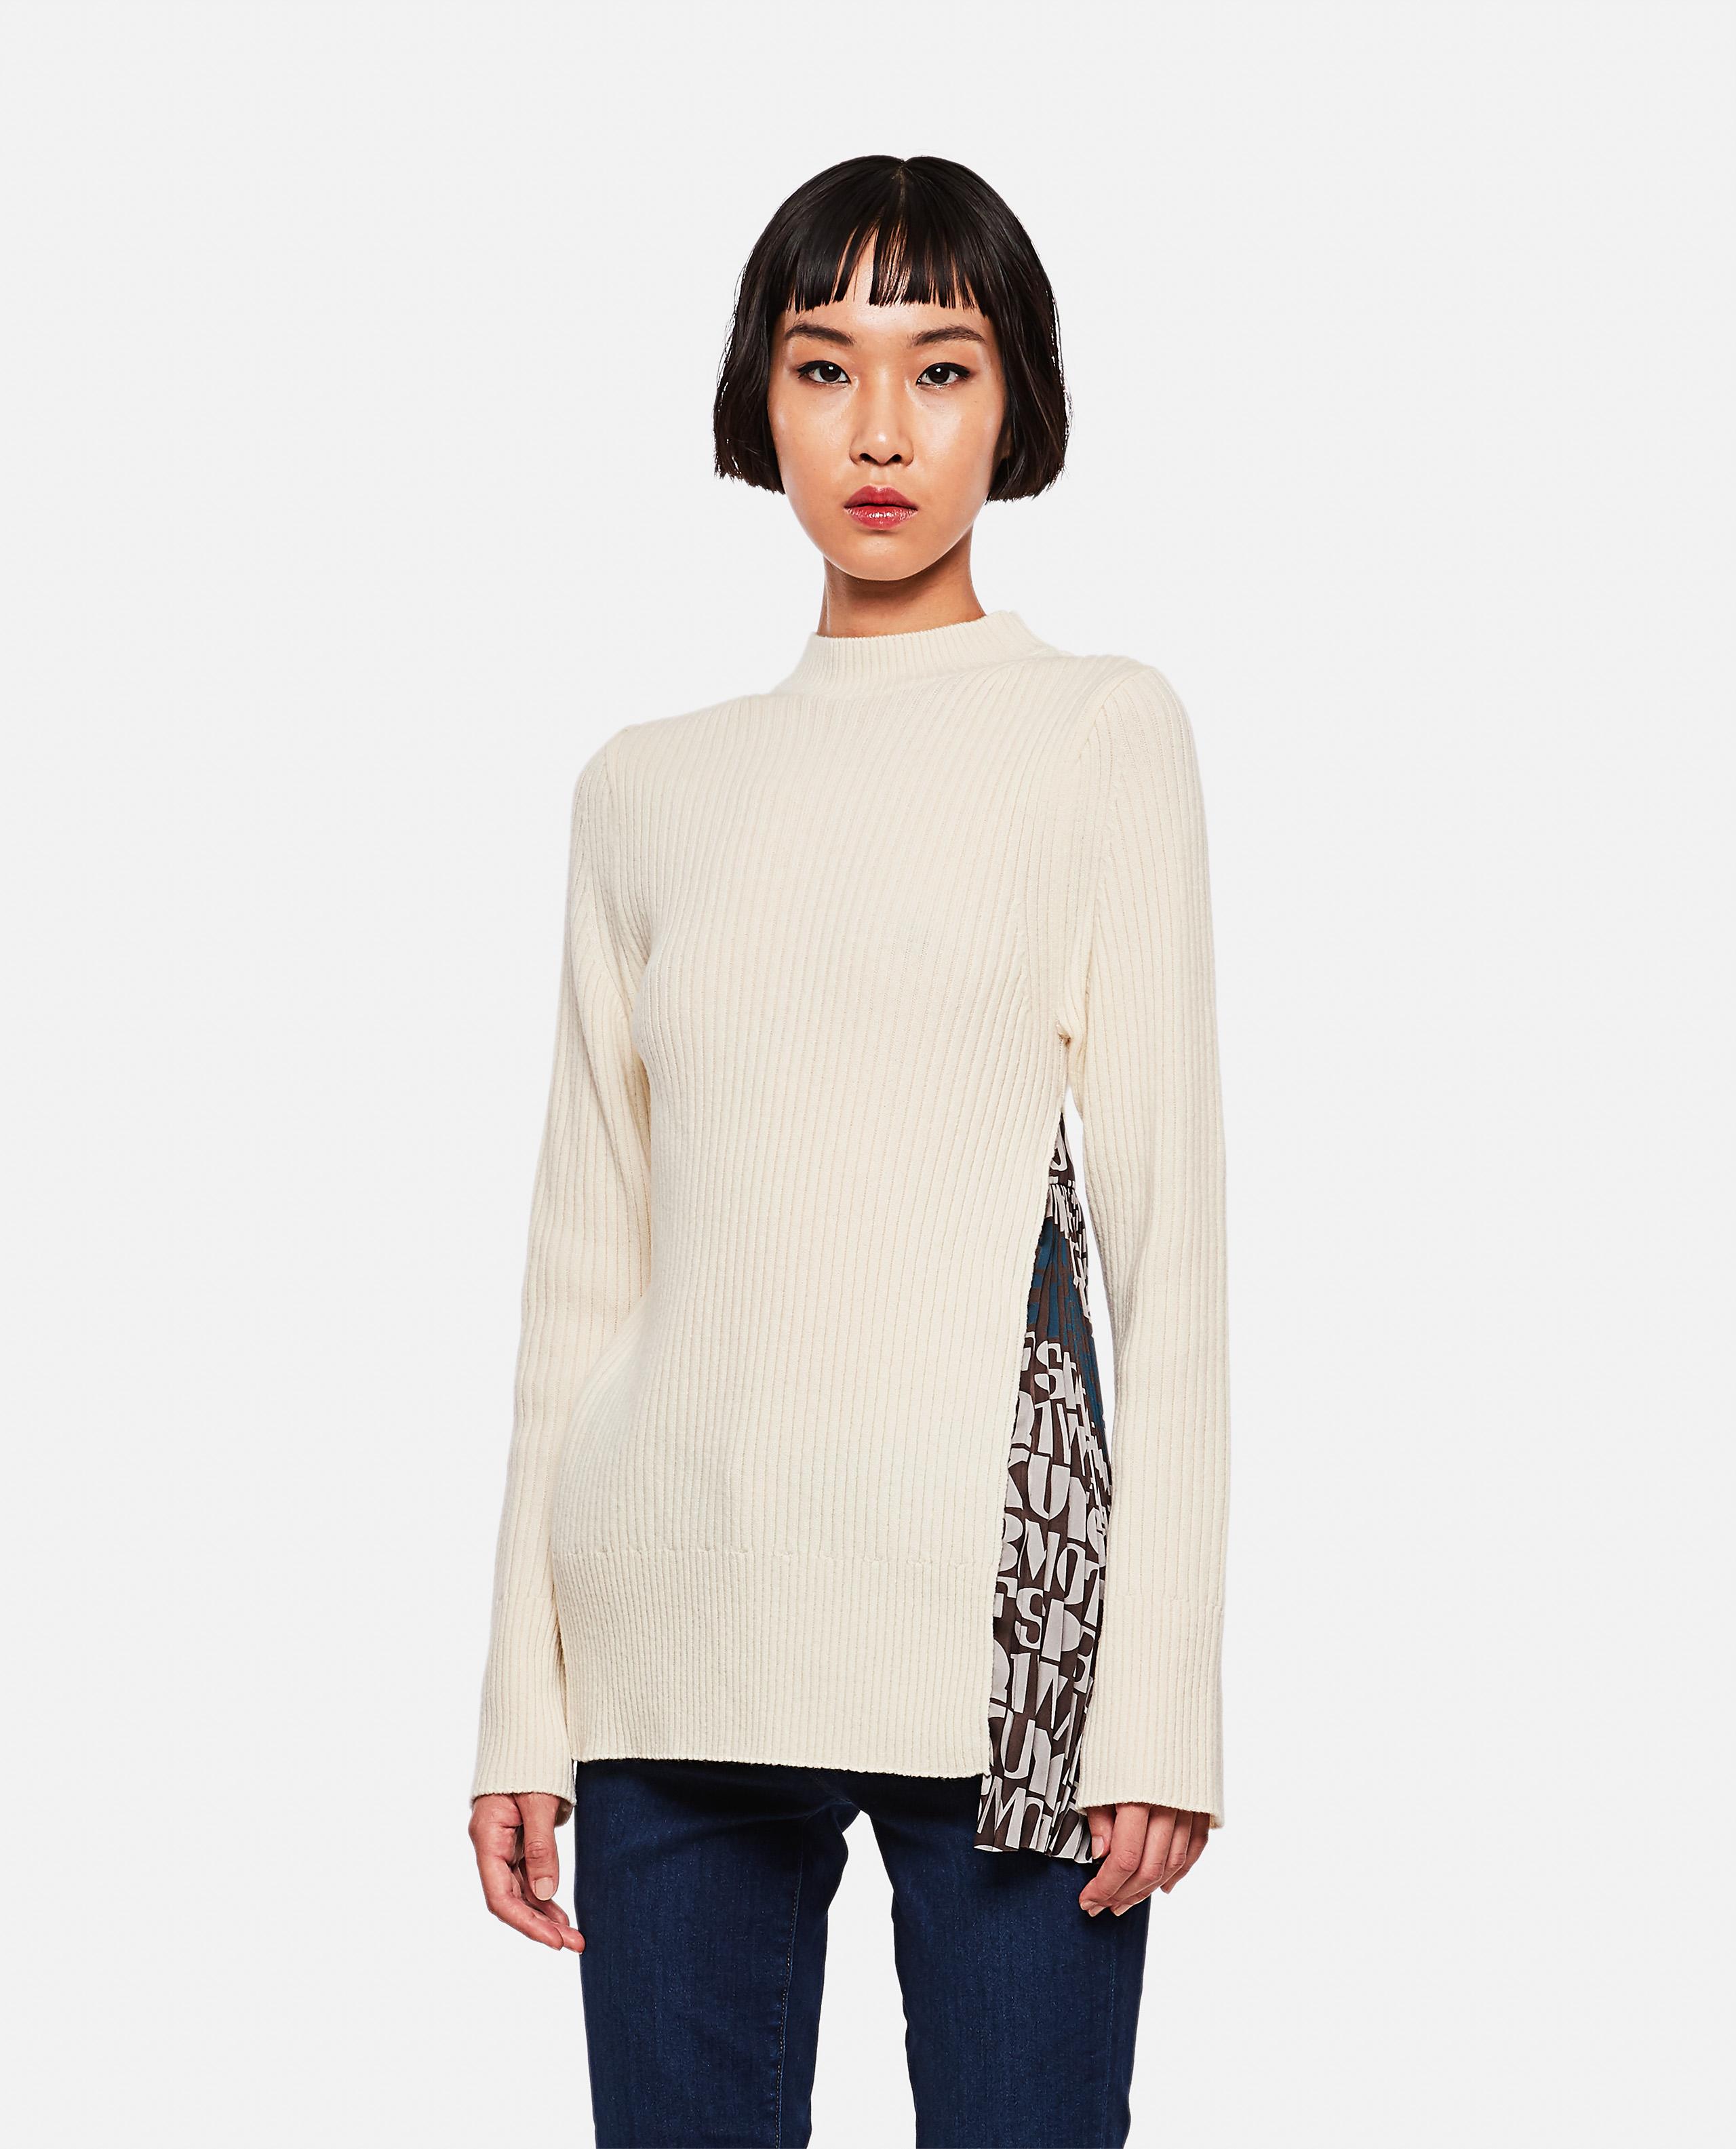 Alexander Girard X Sacai wool sweater